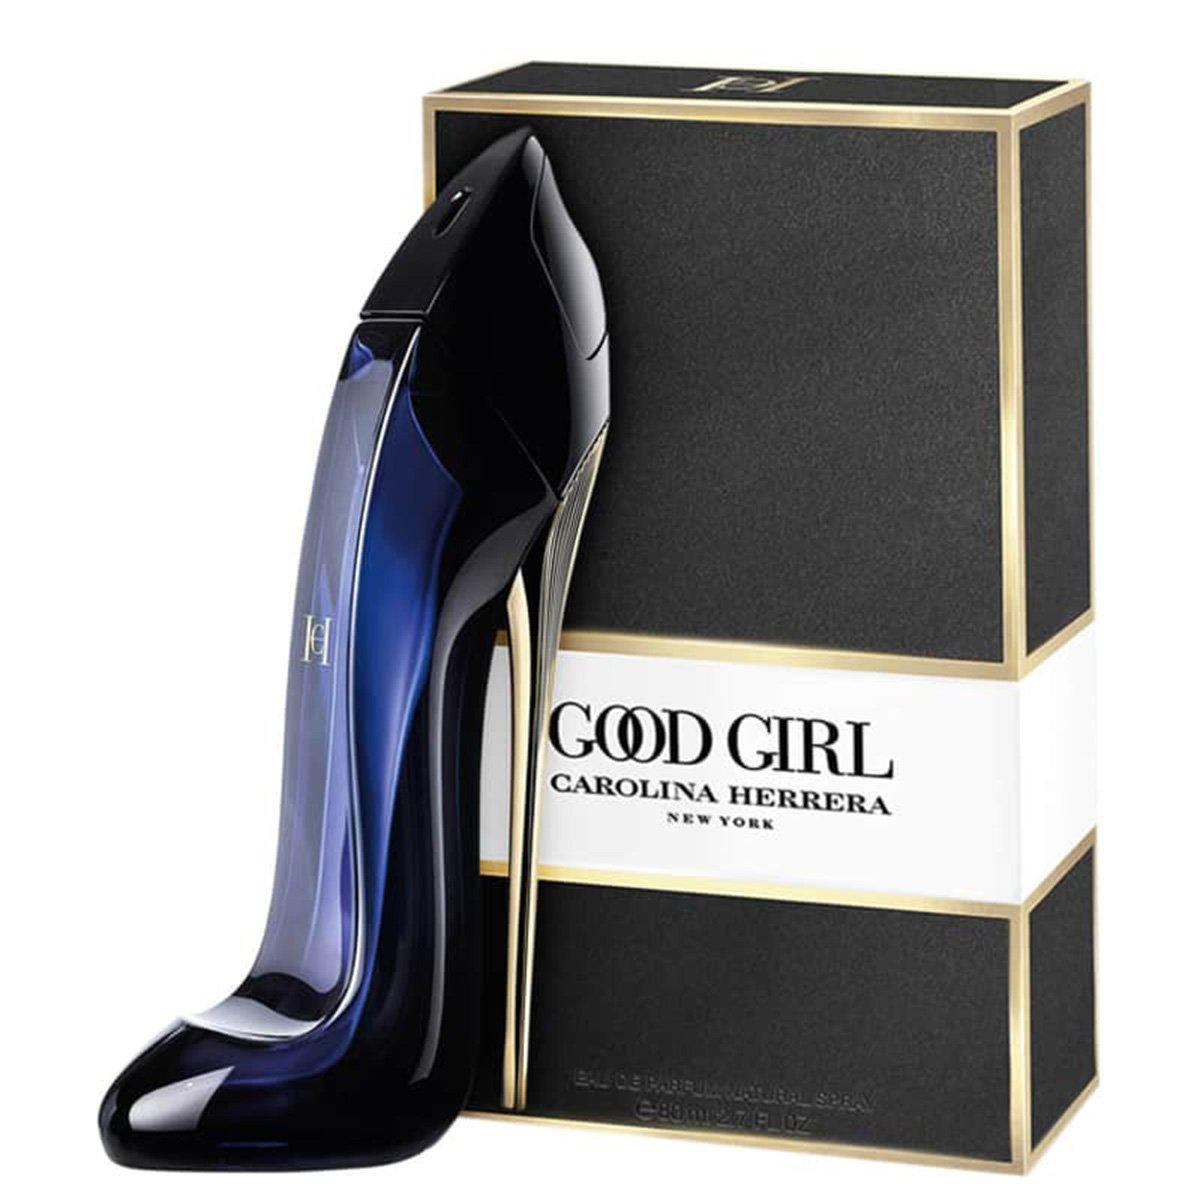 Perfume Good Girl Feminino Carolina Herrera EDP 80ml - Incolor